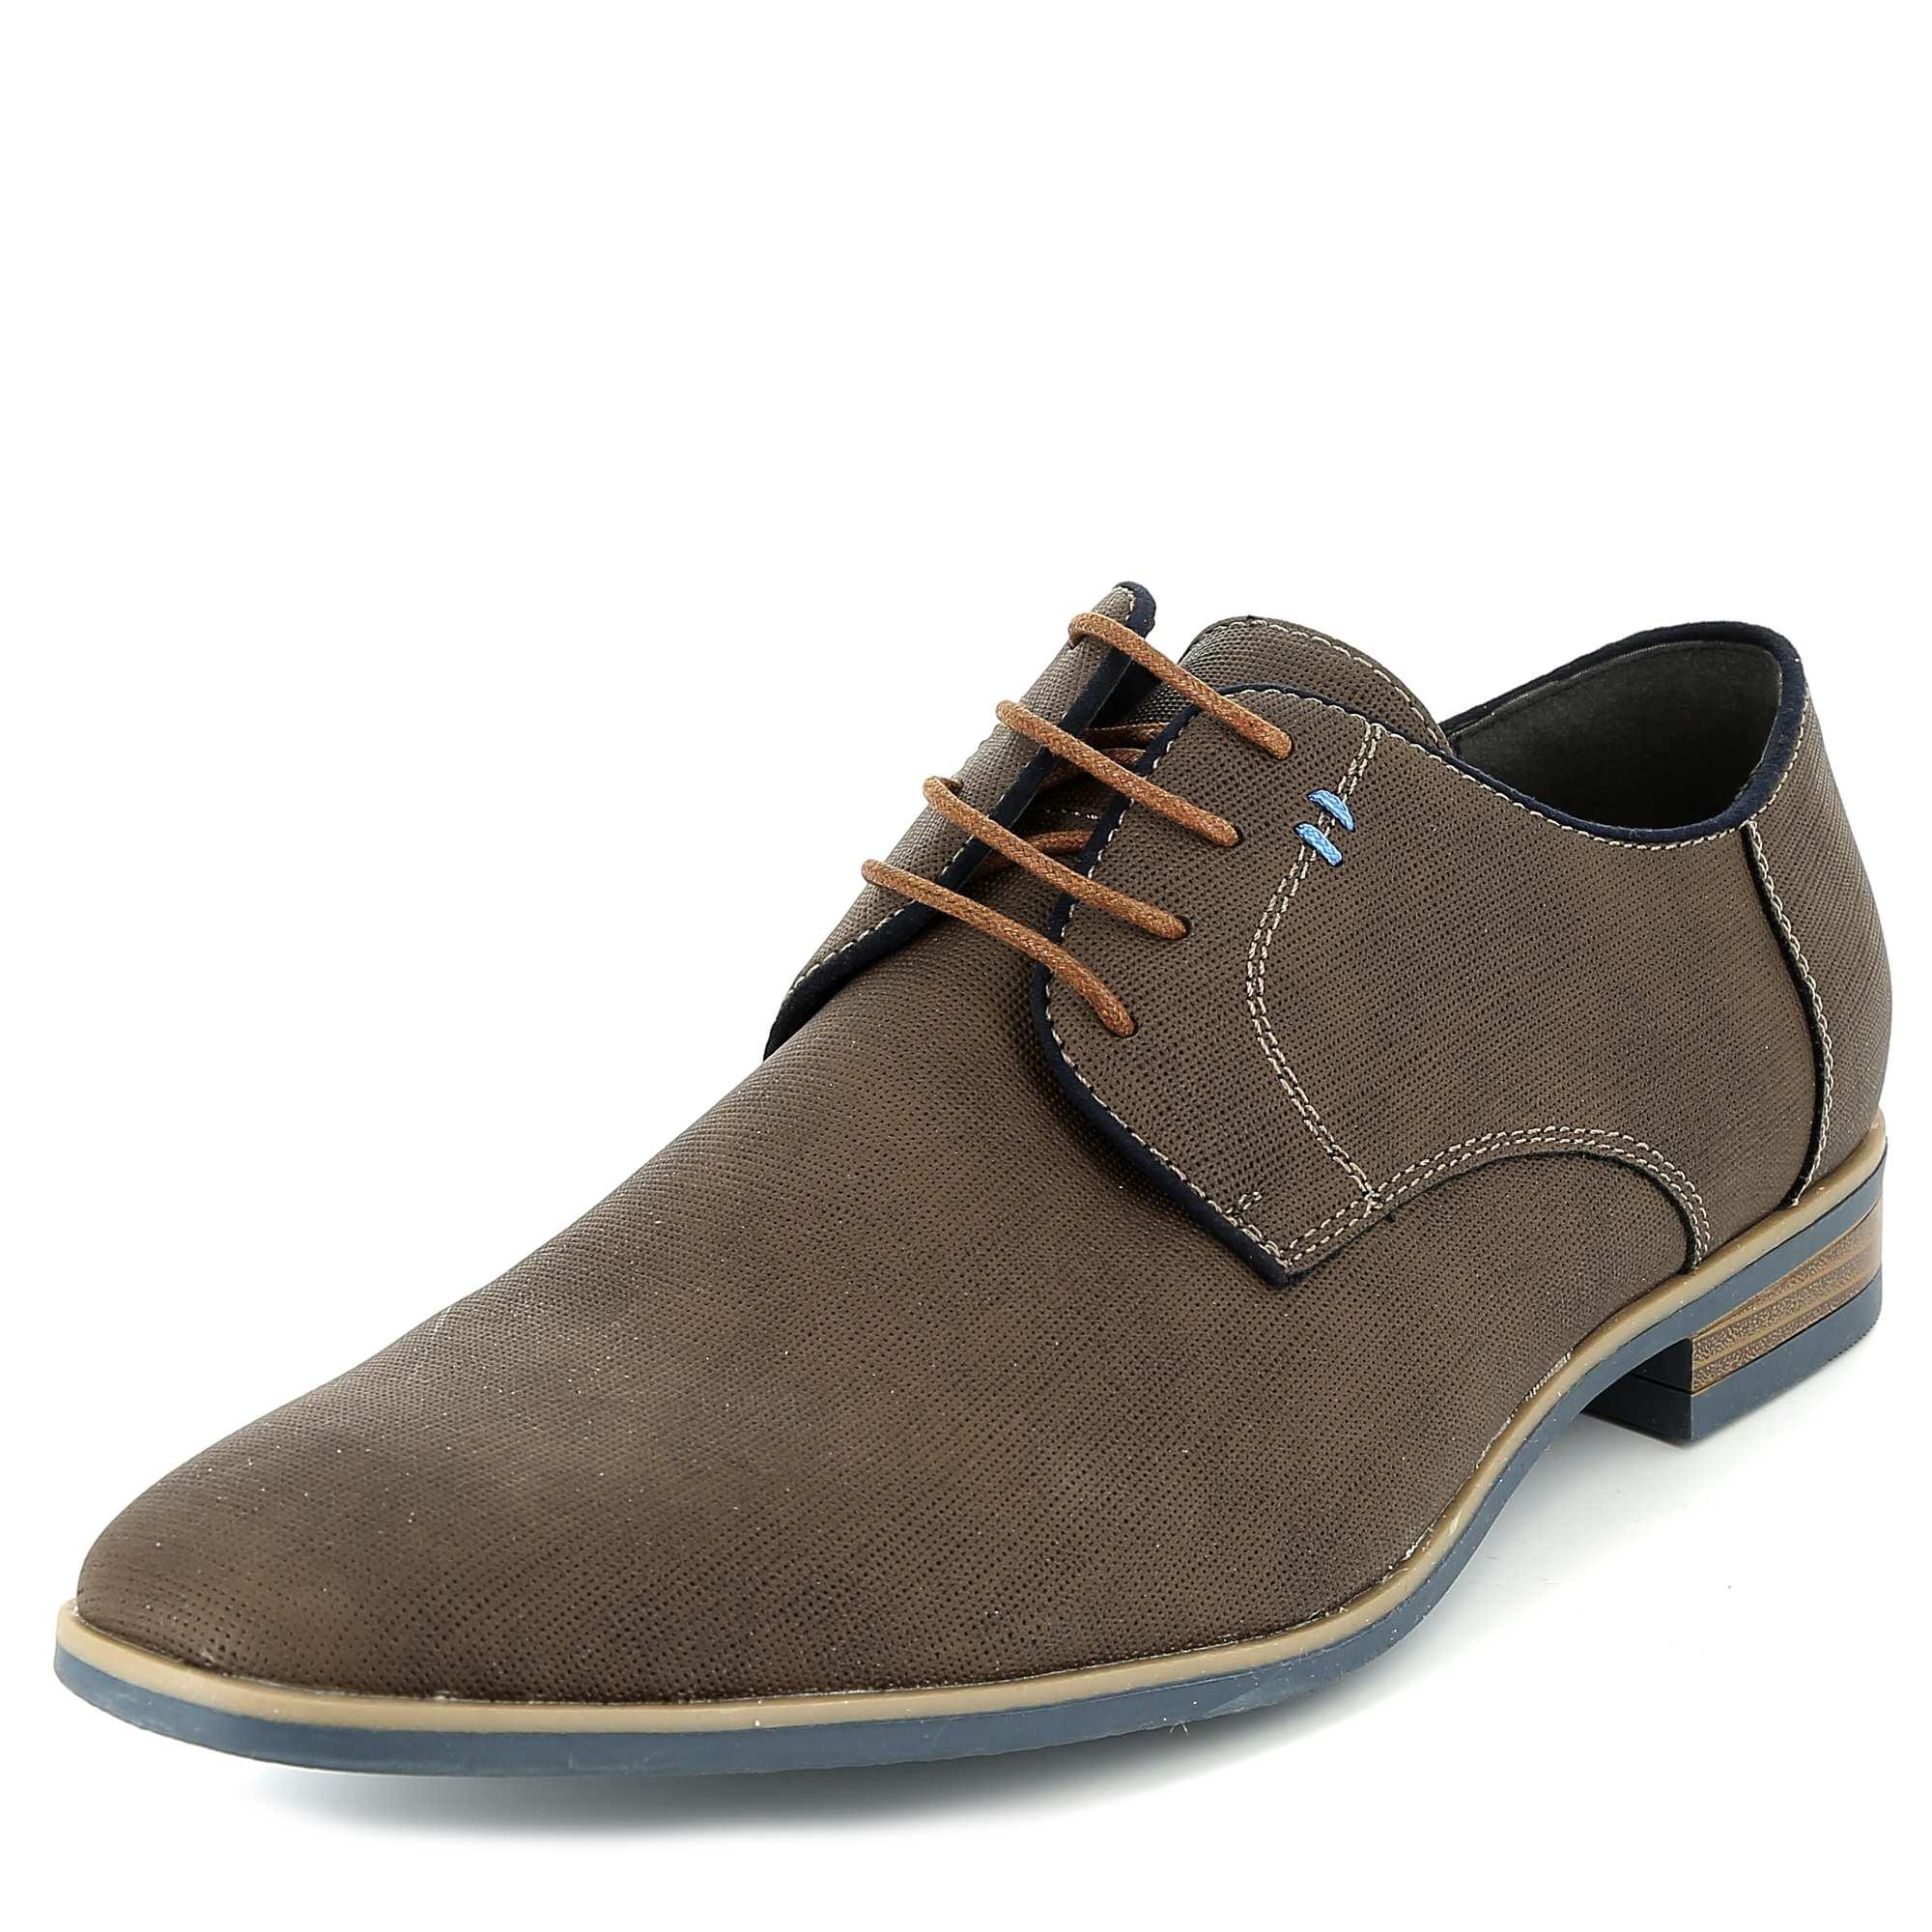 chaussures de ville en simili effet tress homme marron kiabi 28 00. Black Bedroom Furniture Sets. Home Design Ideas